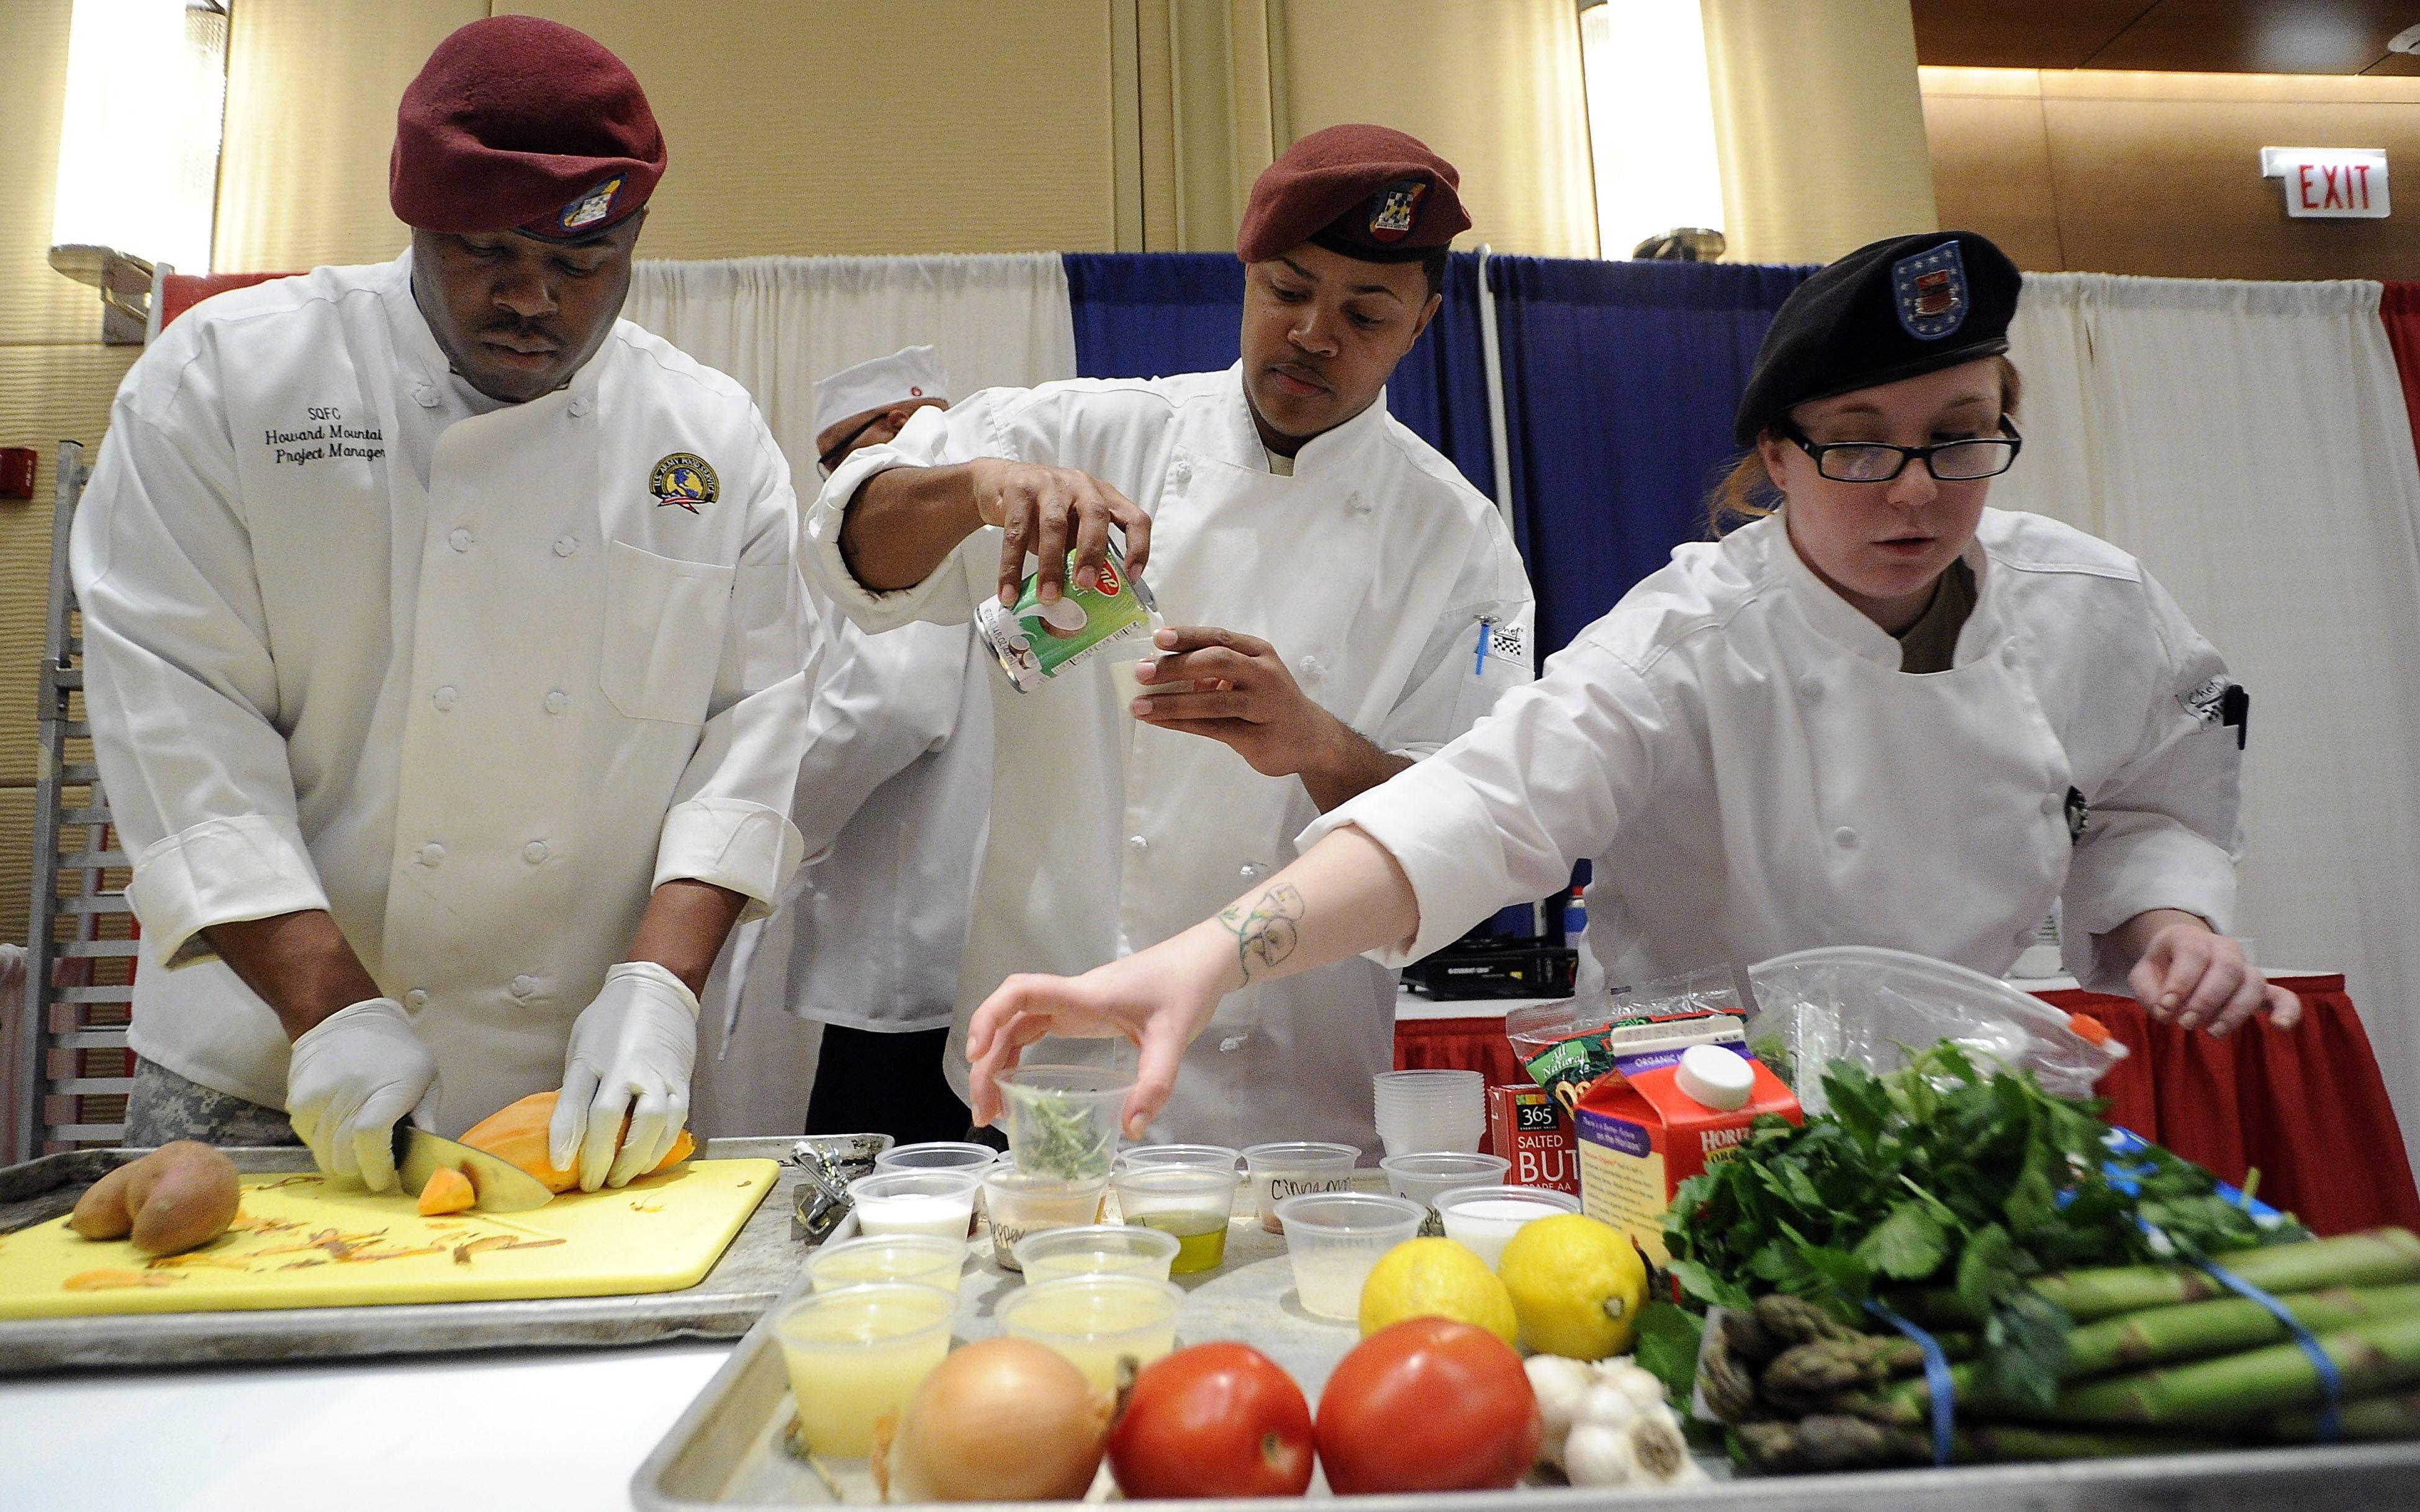 Harper culinary students win foodie showdown